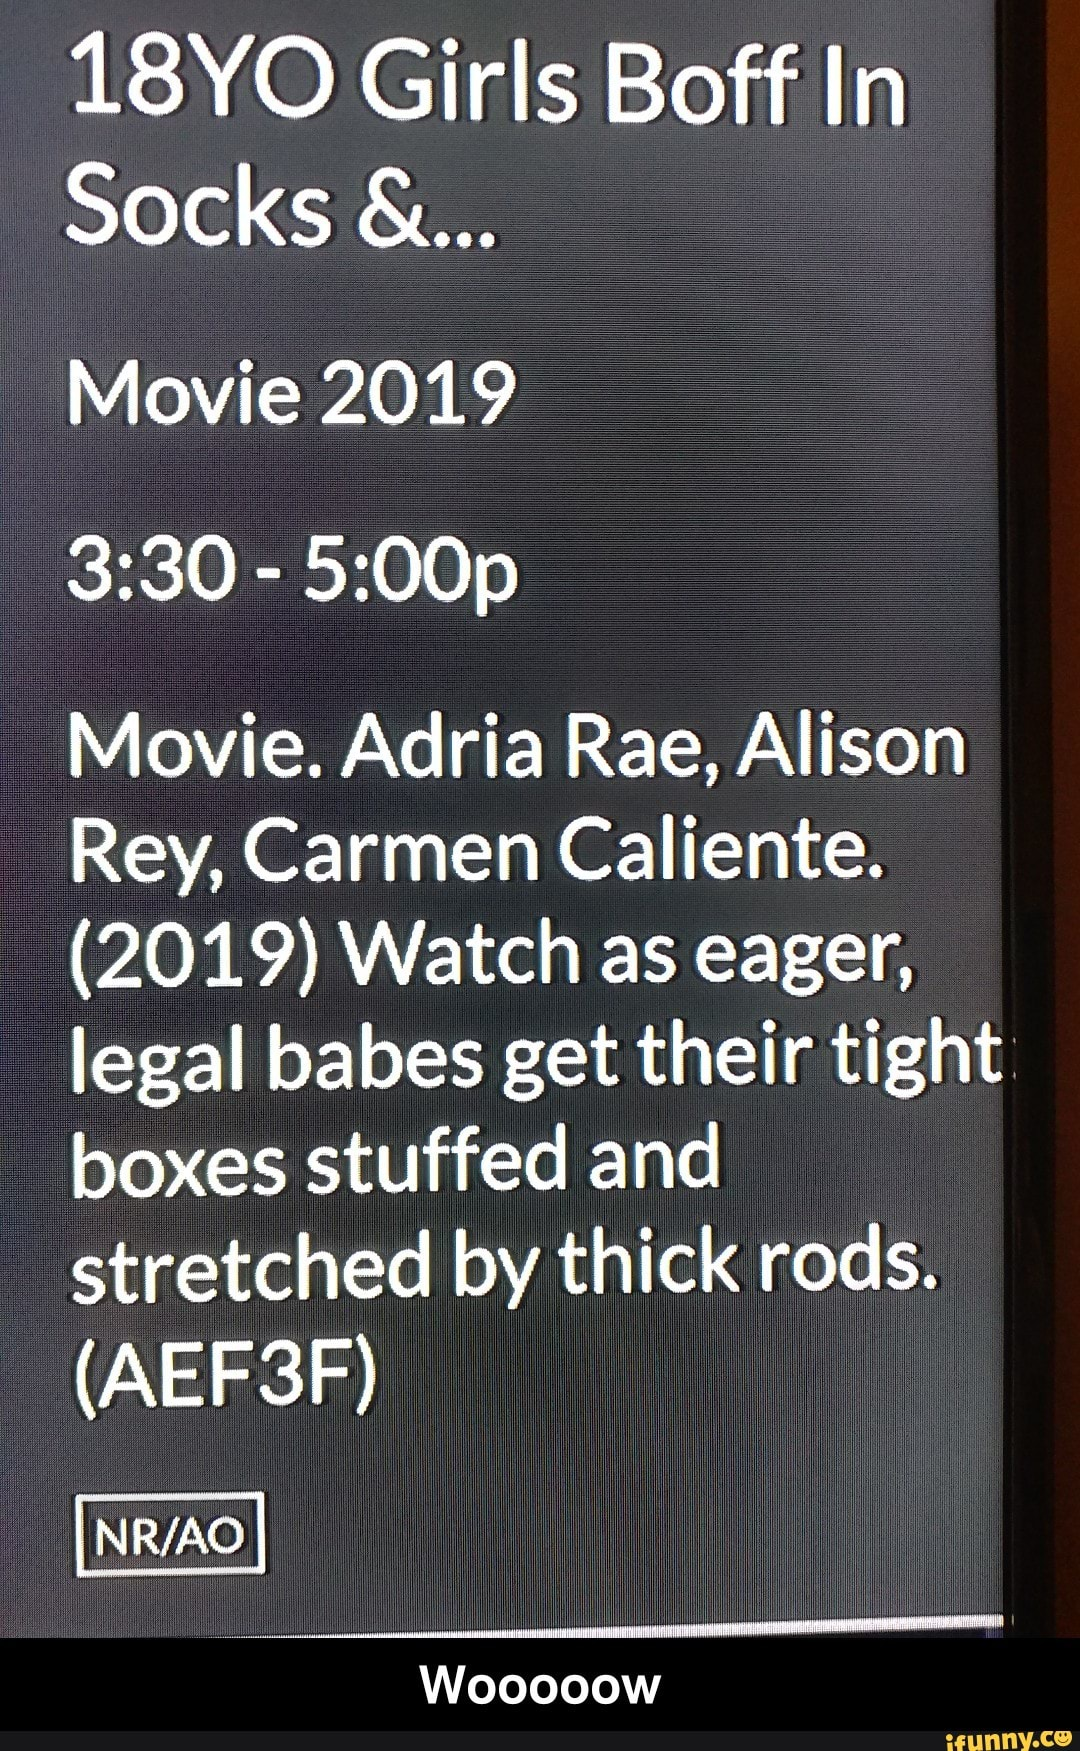 Alison Rey 18yo girls boff in socks & movie 2019 3:30 - 5:00p movie